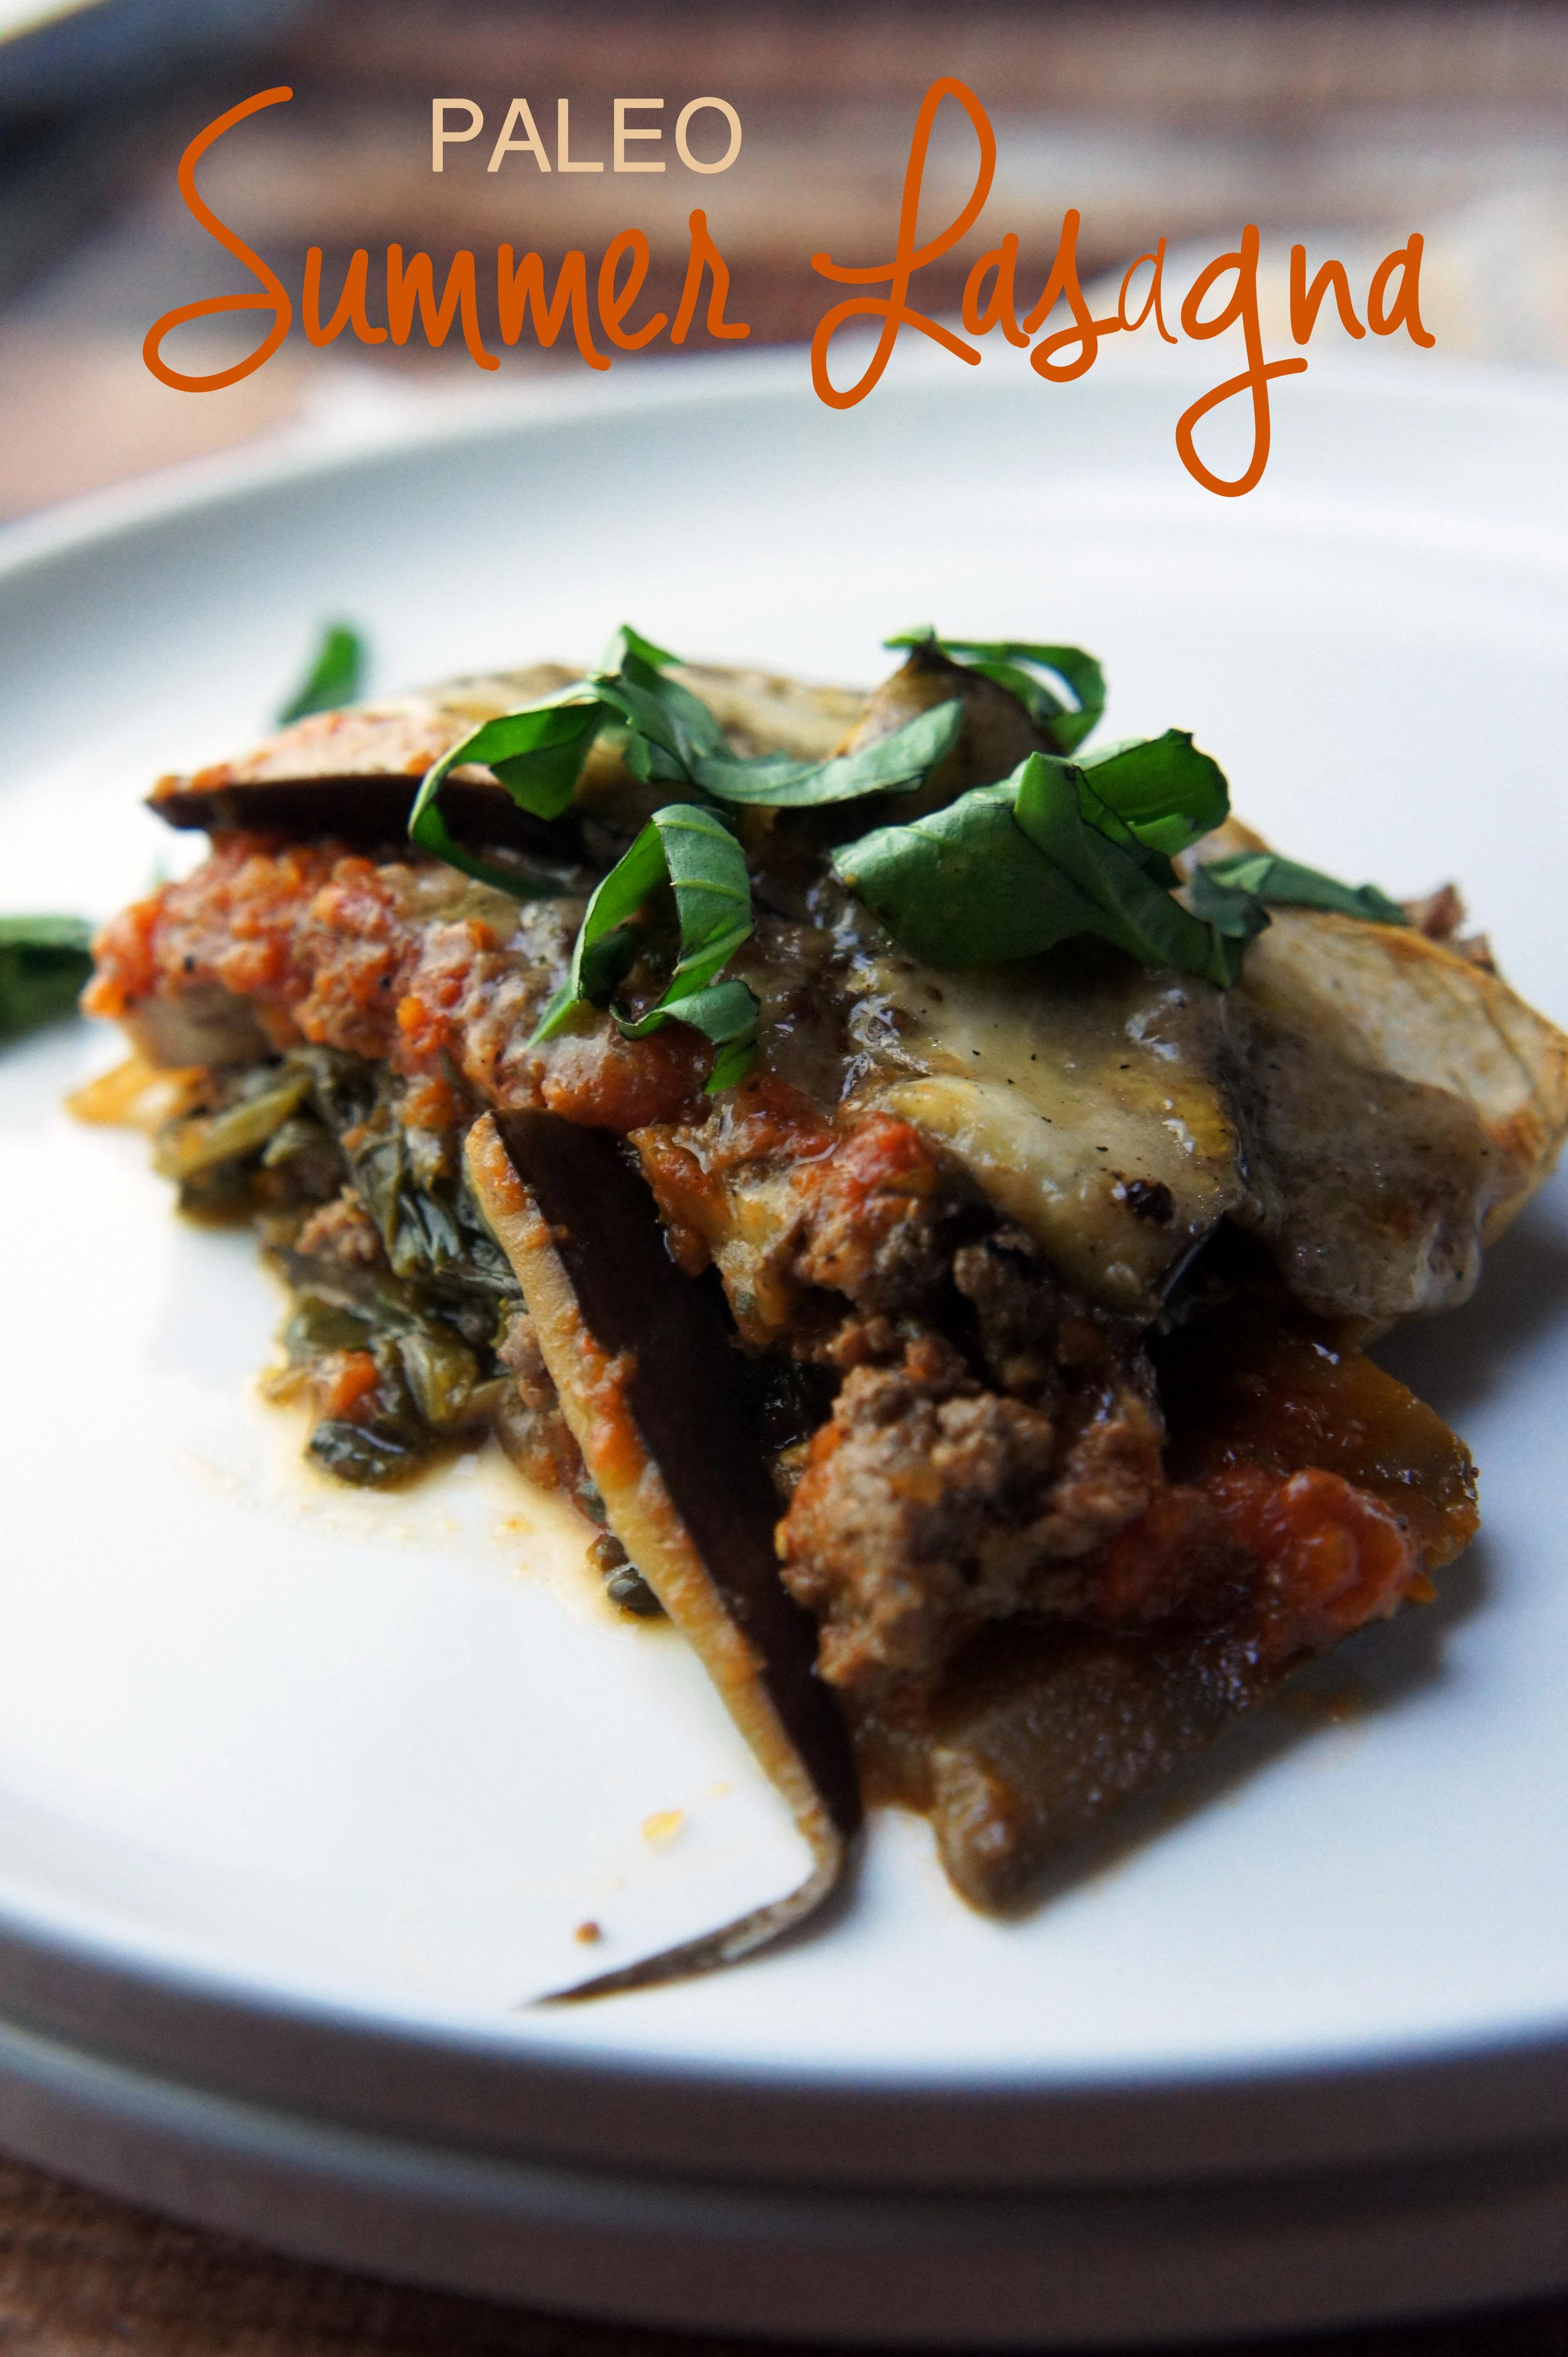 Summer Vegetable Lasagna (paleo and gluten free!)